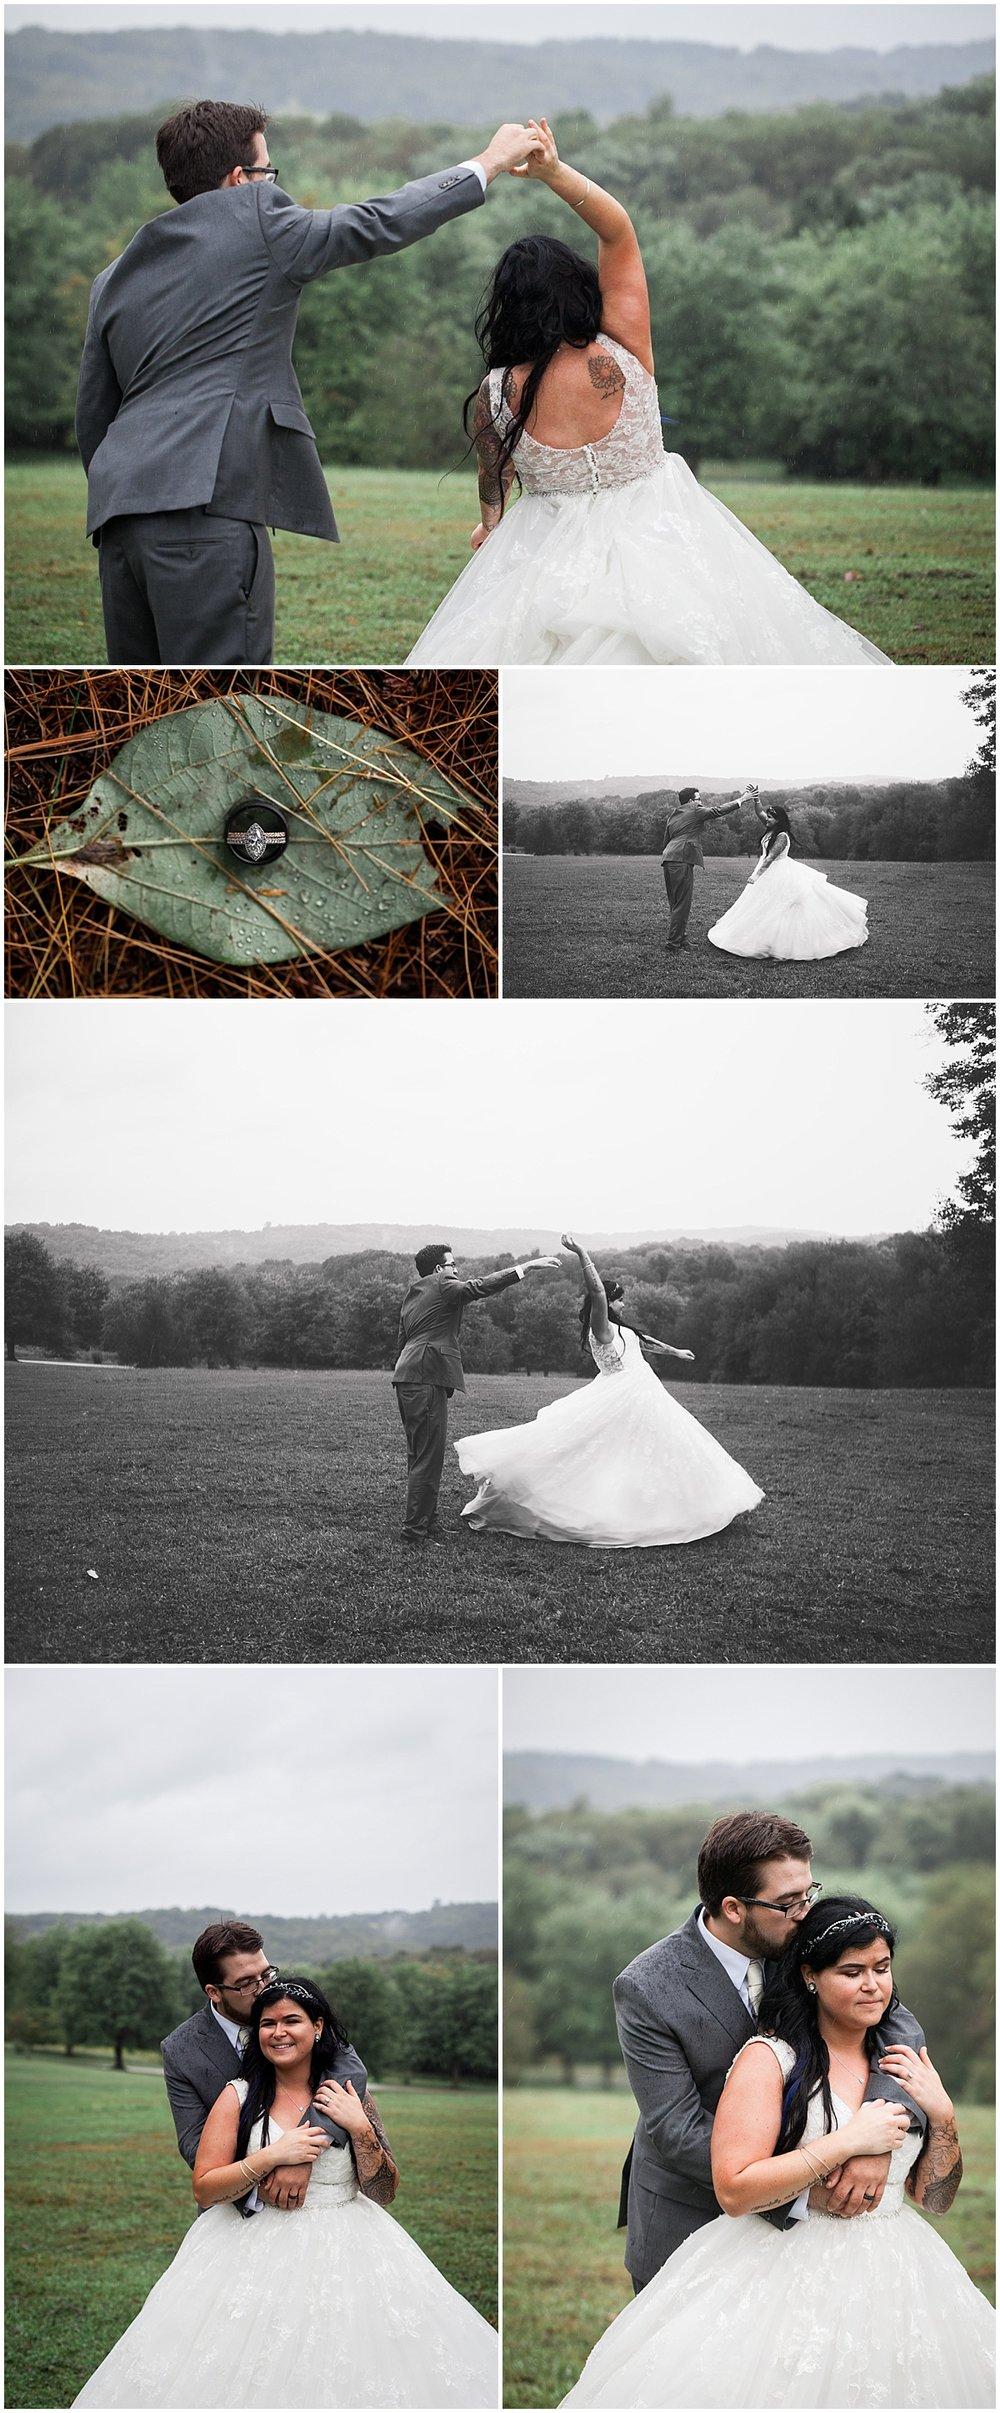 rainy bride and groom wedding portrait photographer